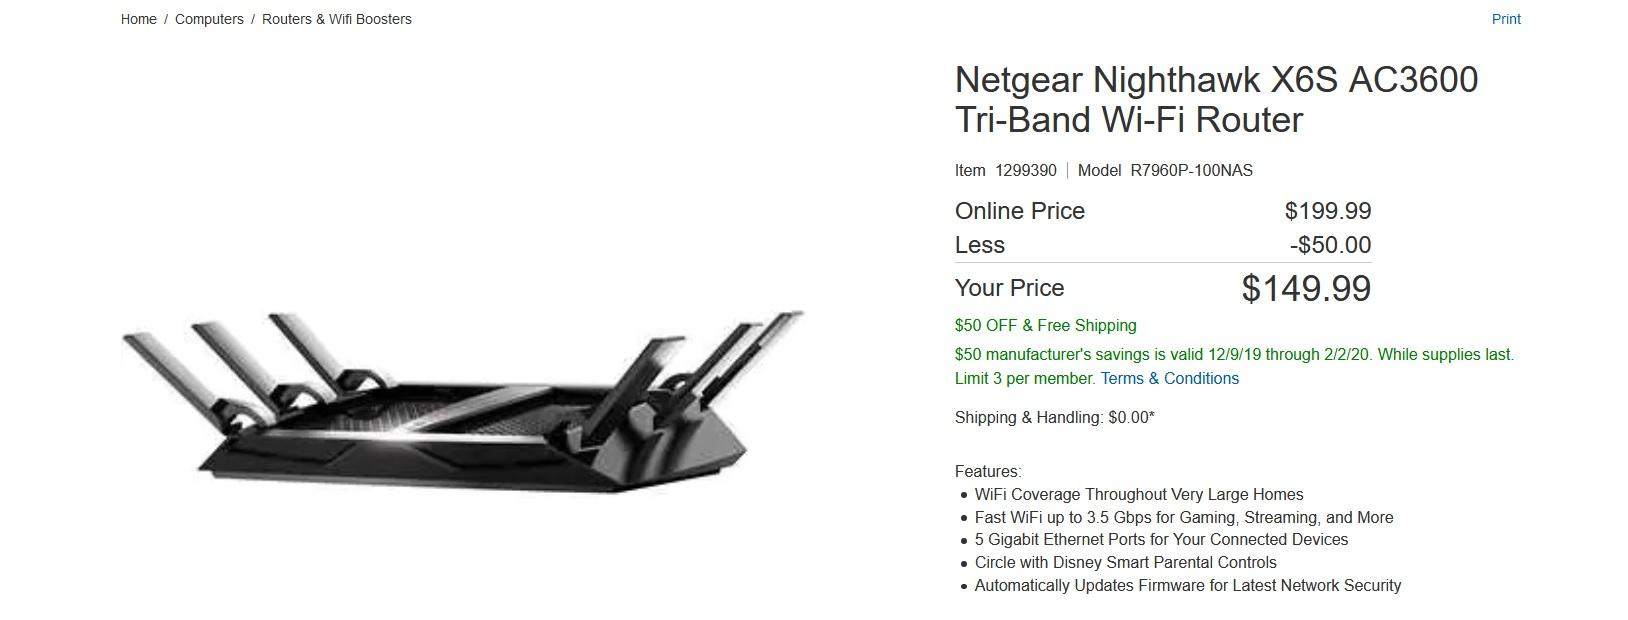 Netgear Nighthawk.jpg